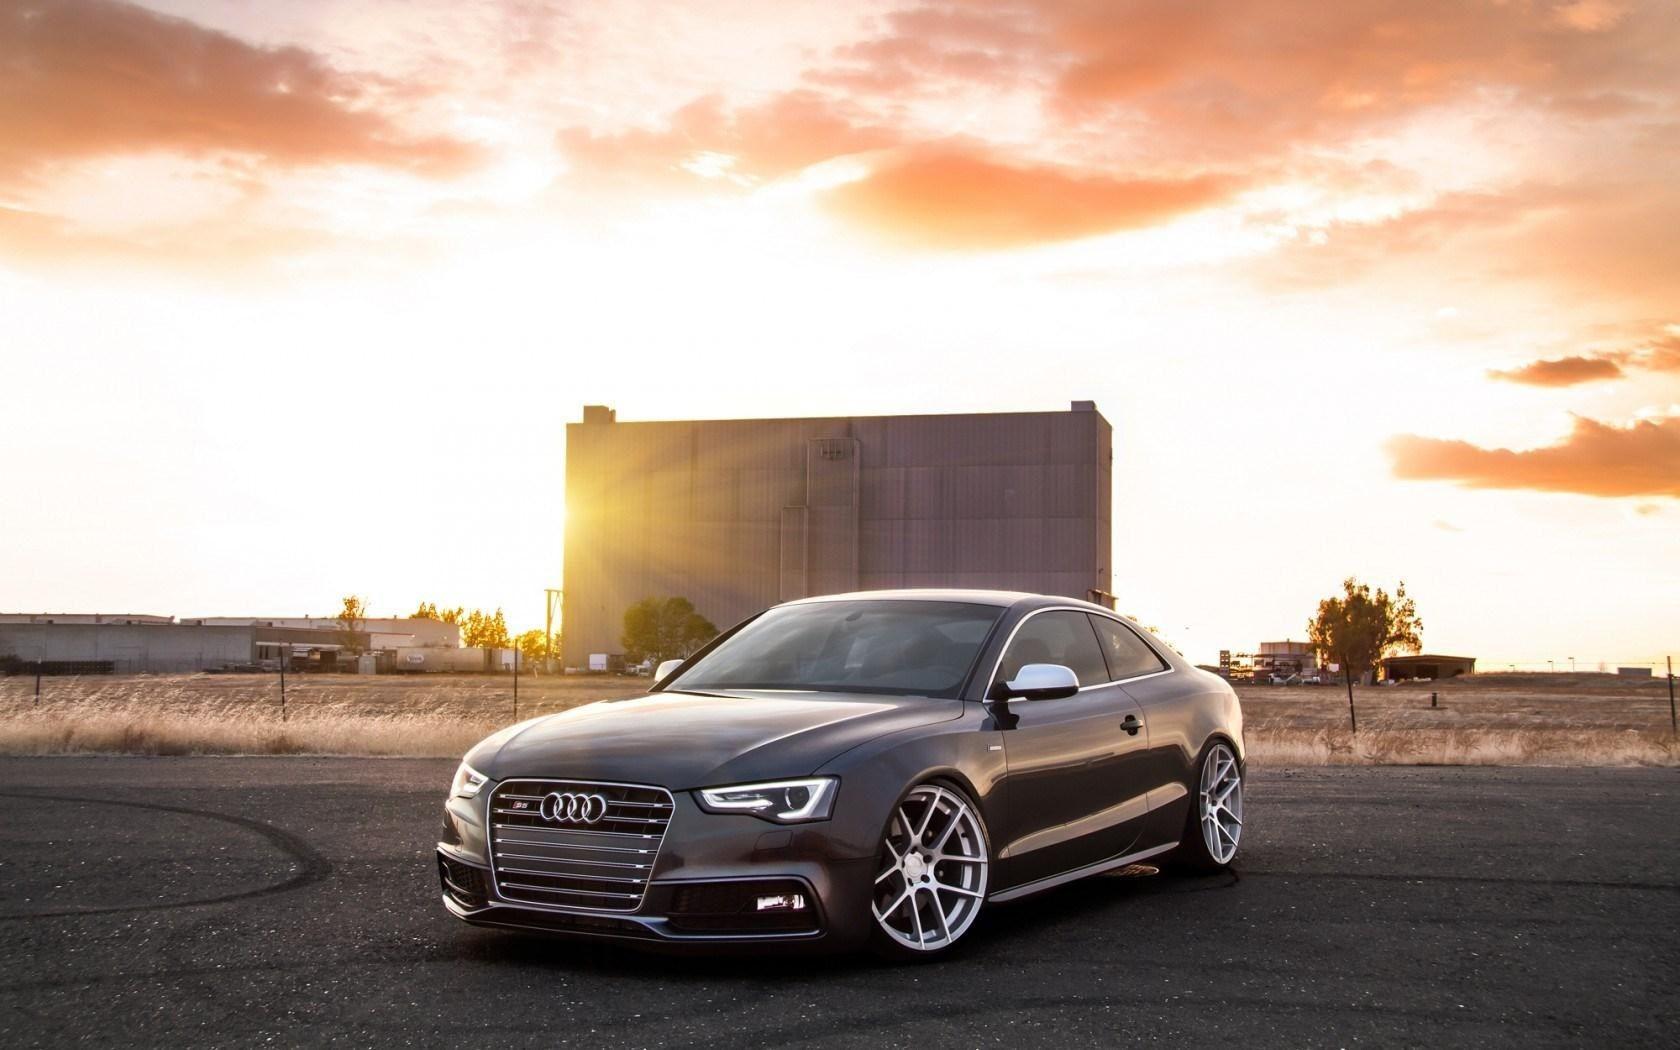 Most Beautiful Audi S5 Wallpaper Audi Rs7 Audi Audi S5